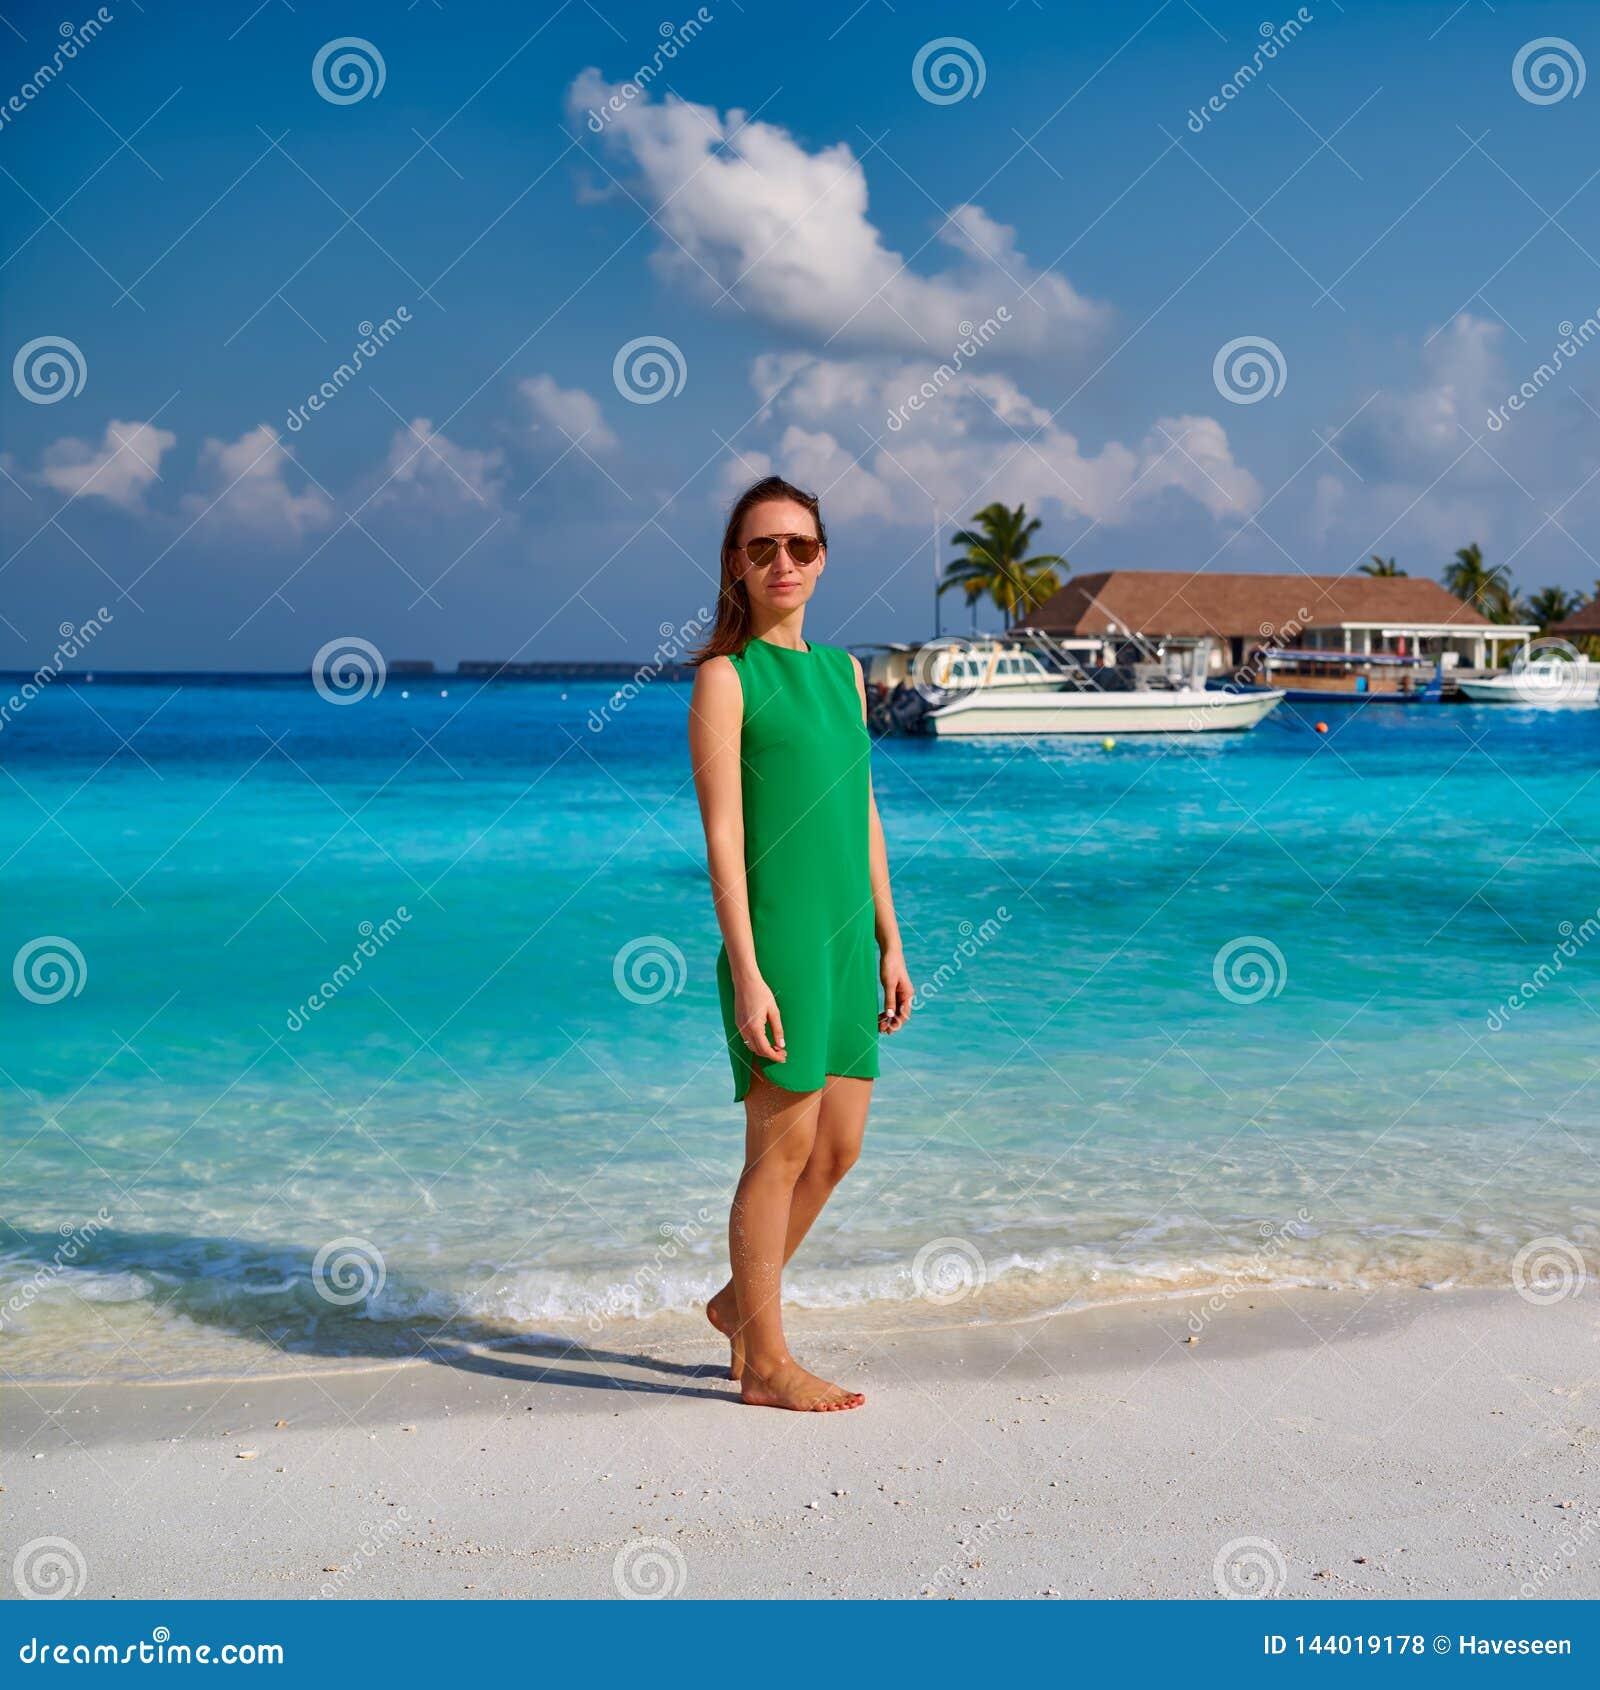 Woman In Dress Walking On Tropical Beach Stock Photo